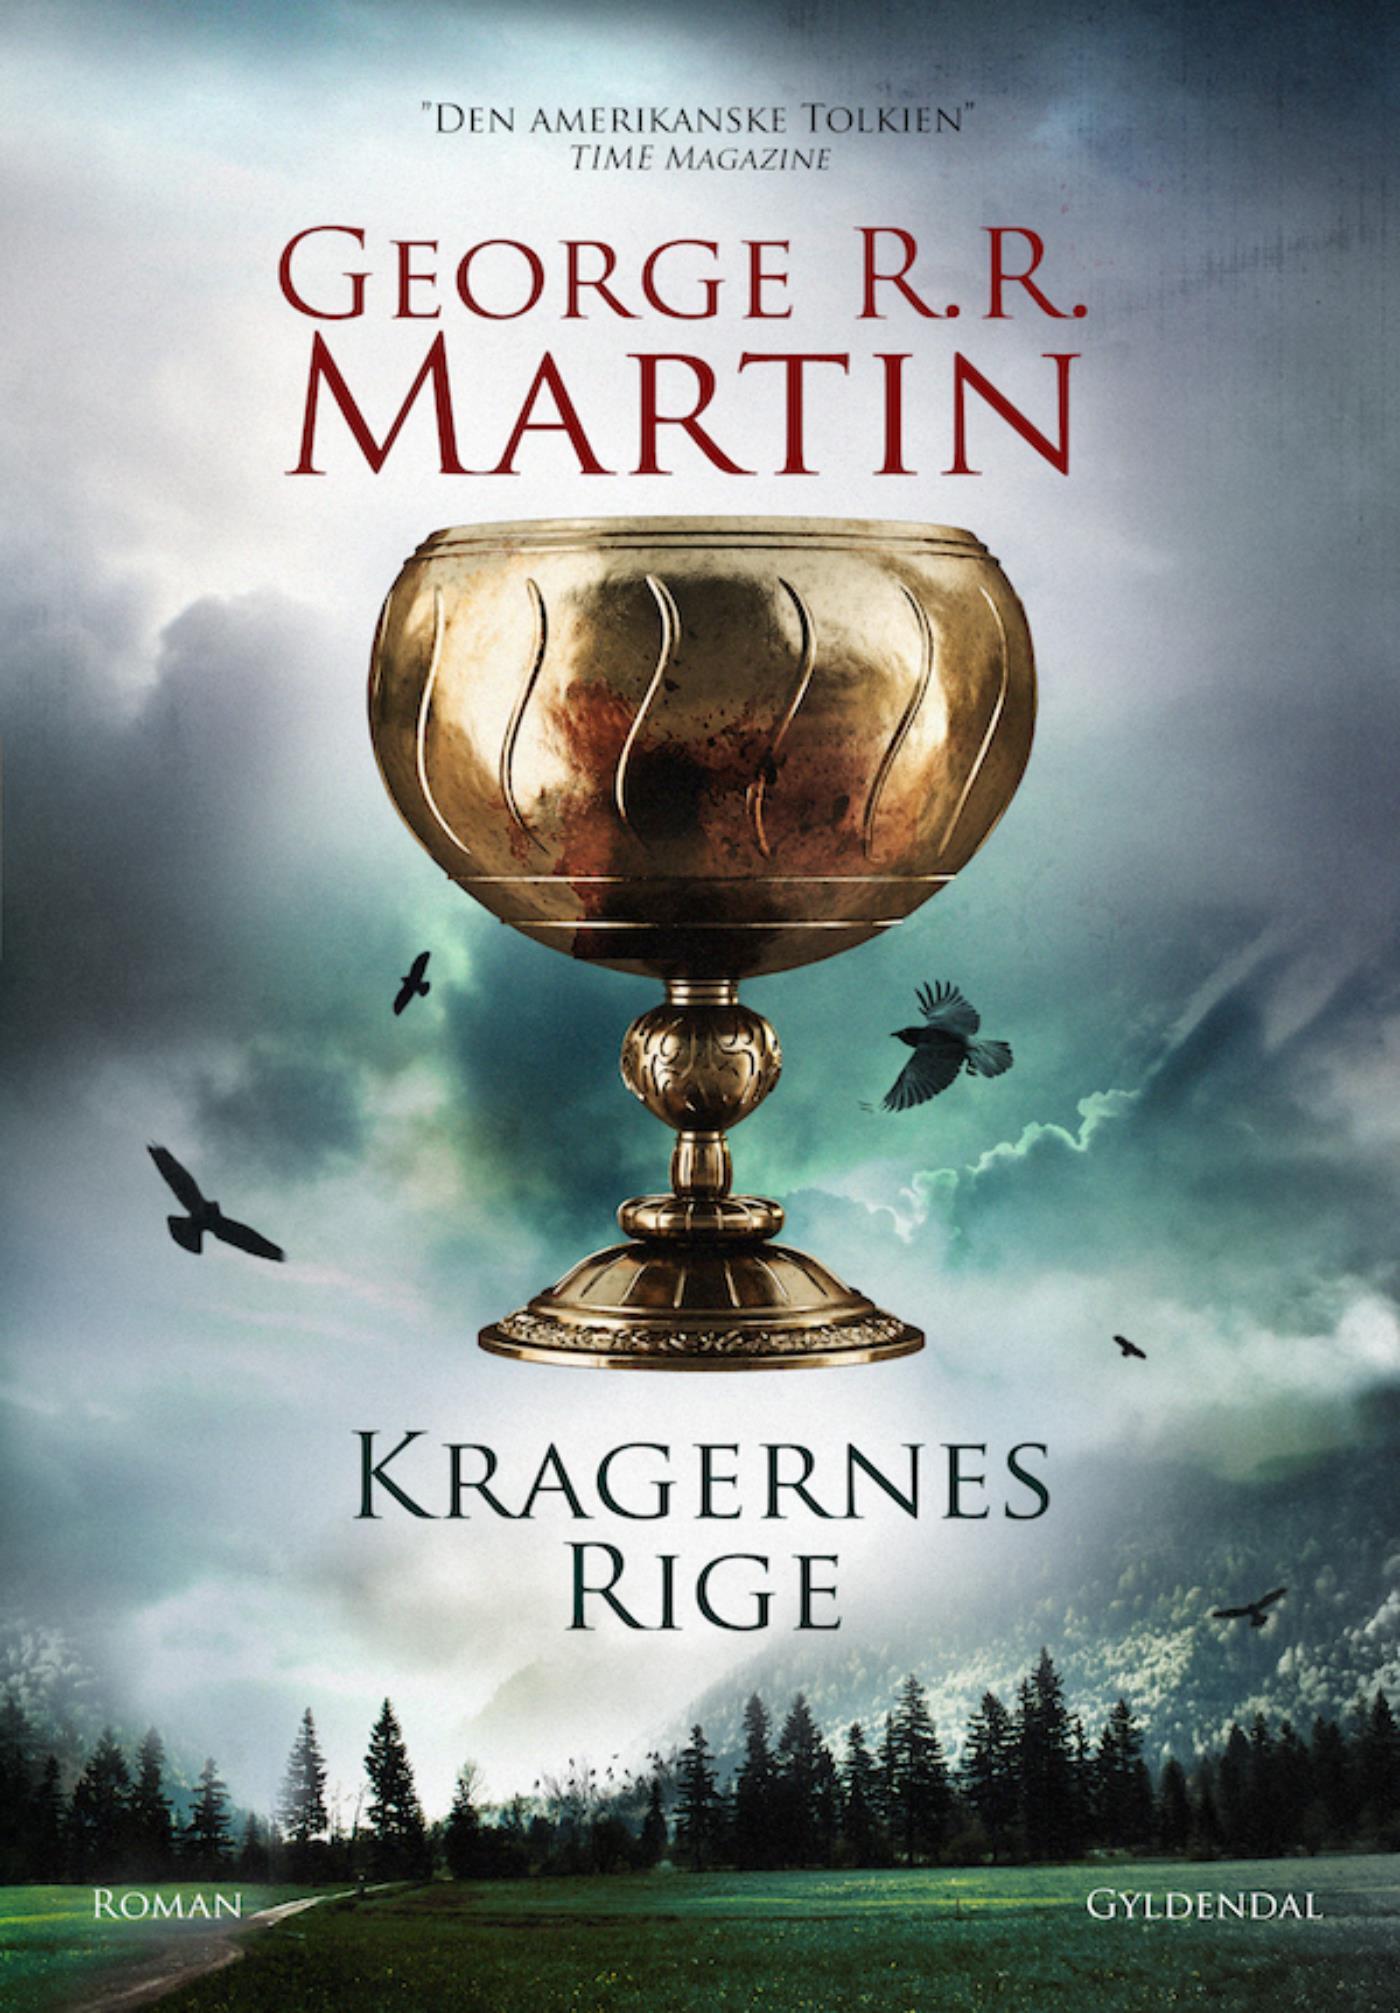 Kragernes rige [4]